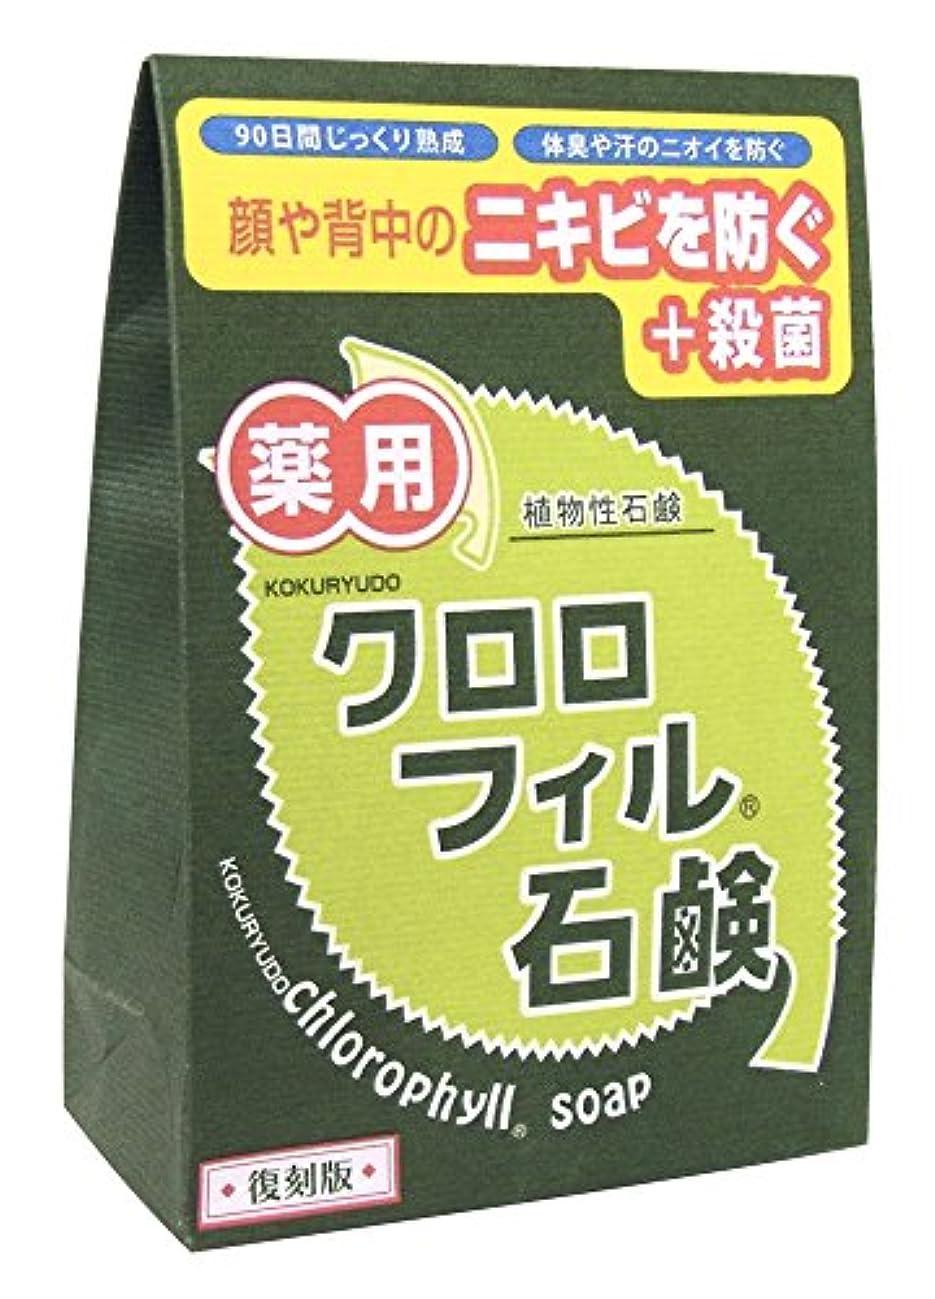 休日入場側溝クロロフィル石鹸 復刻版 85g (医薬部外品)